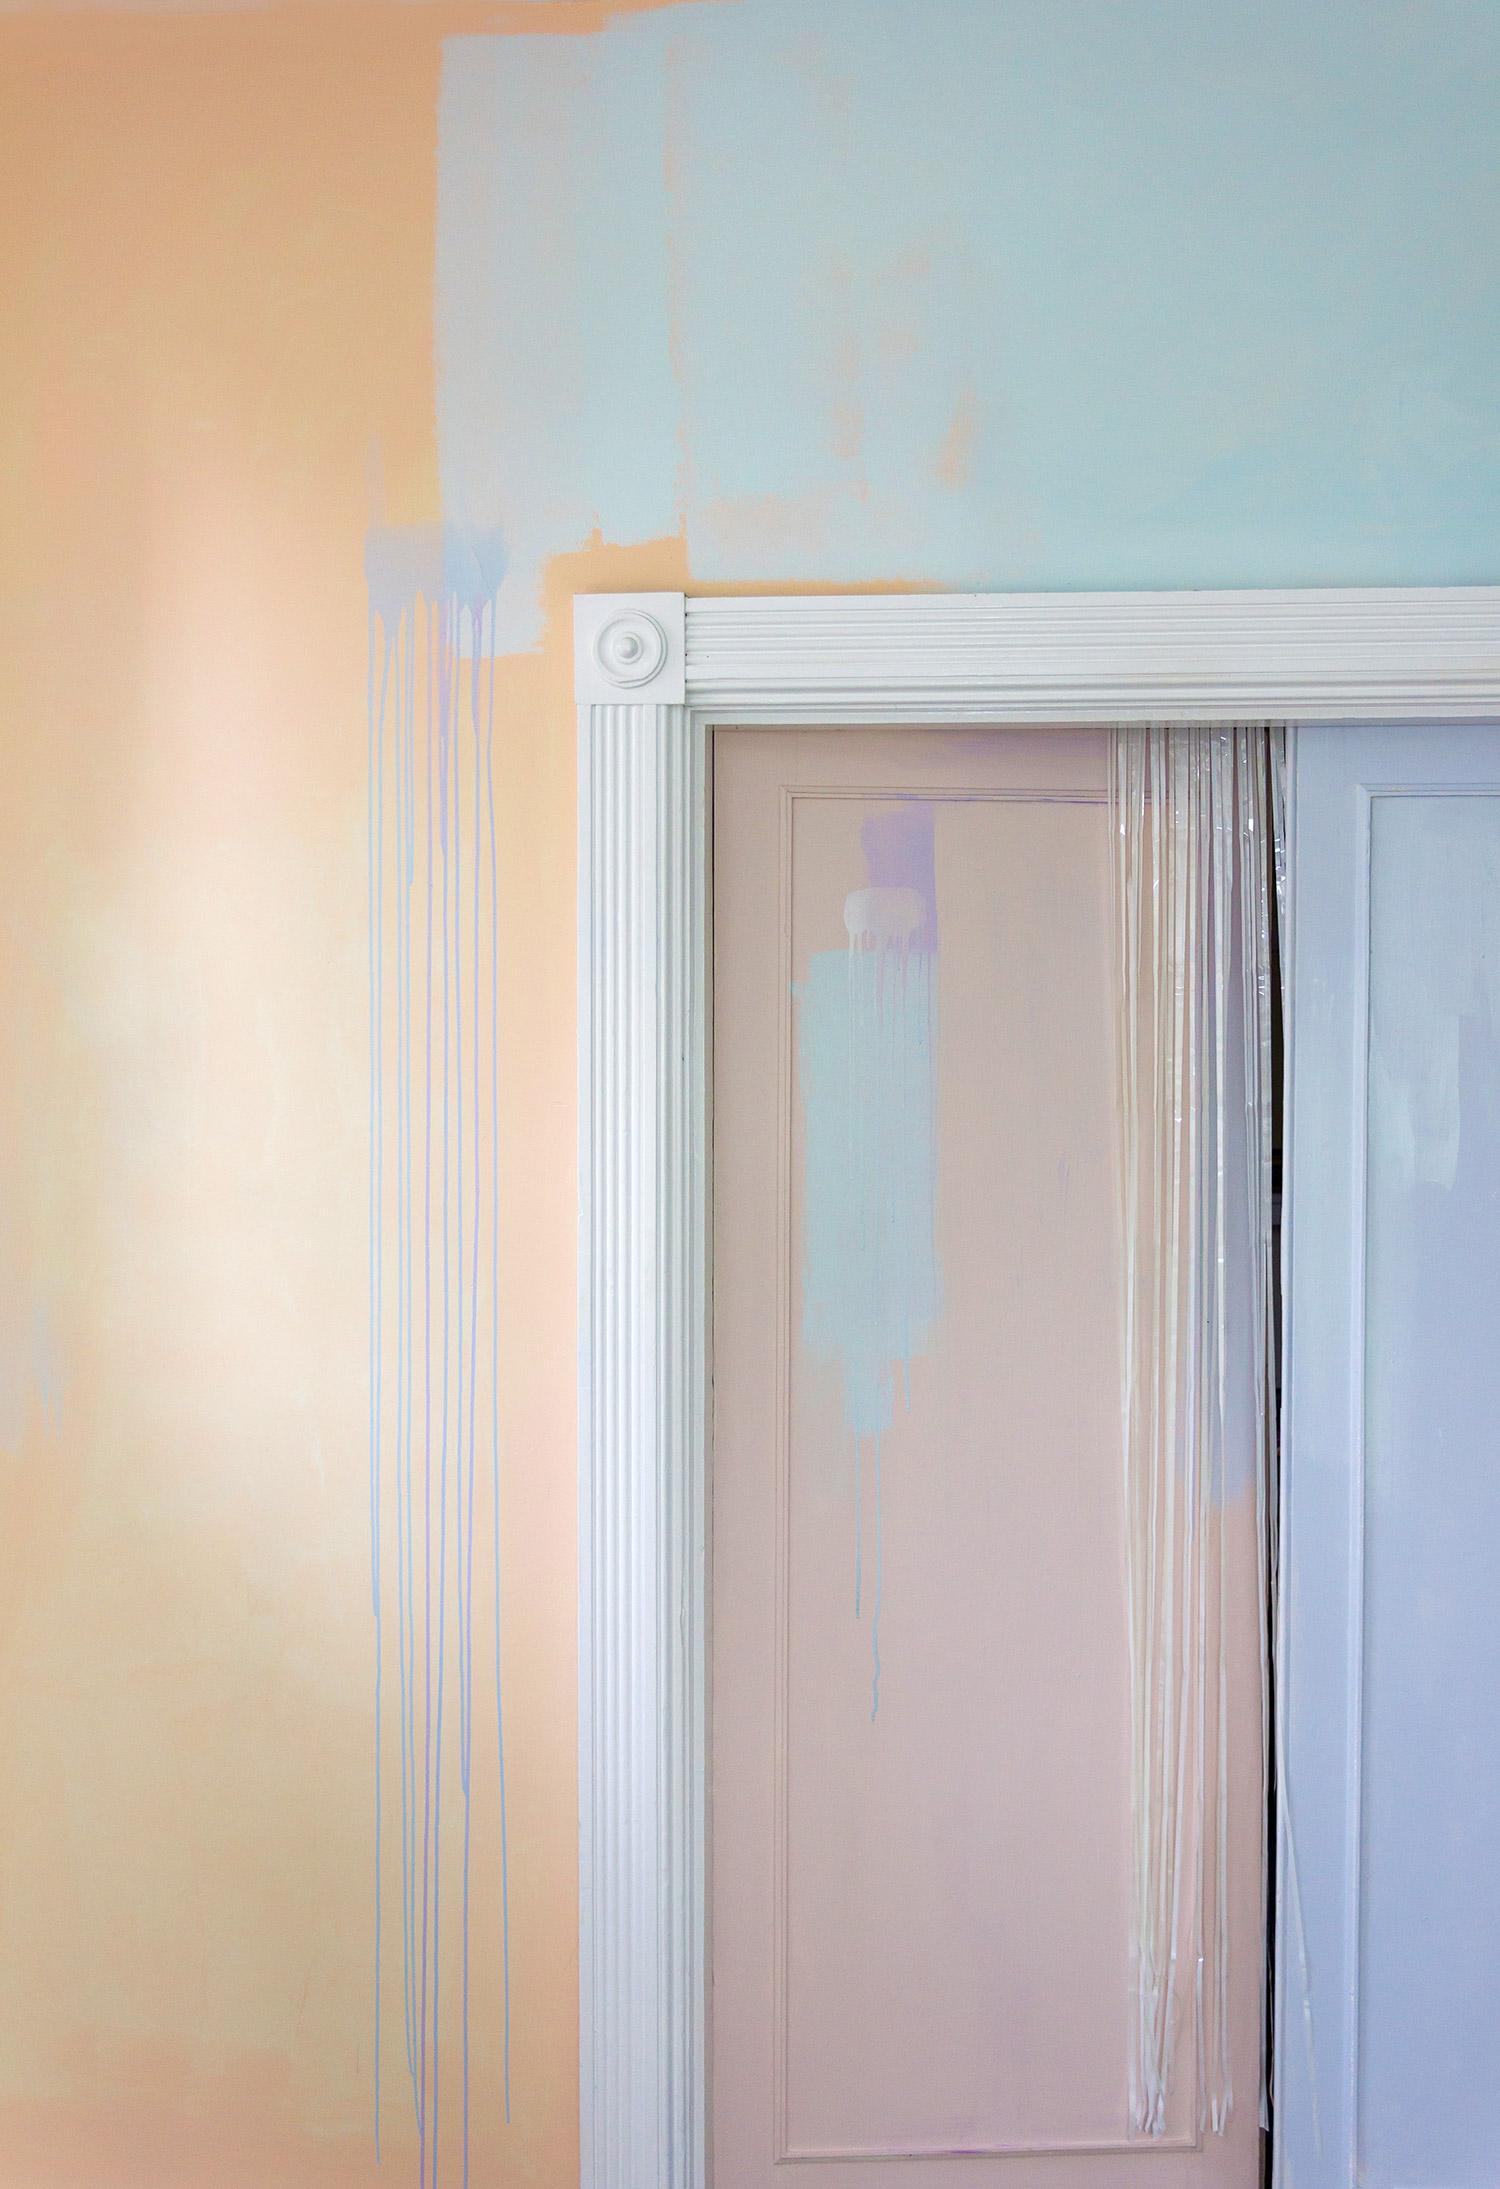 mural-pastel-magical-child-camillejaval-02.jpg